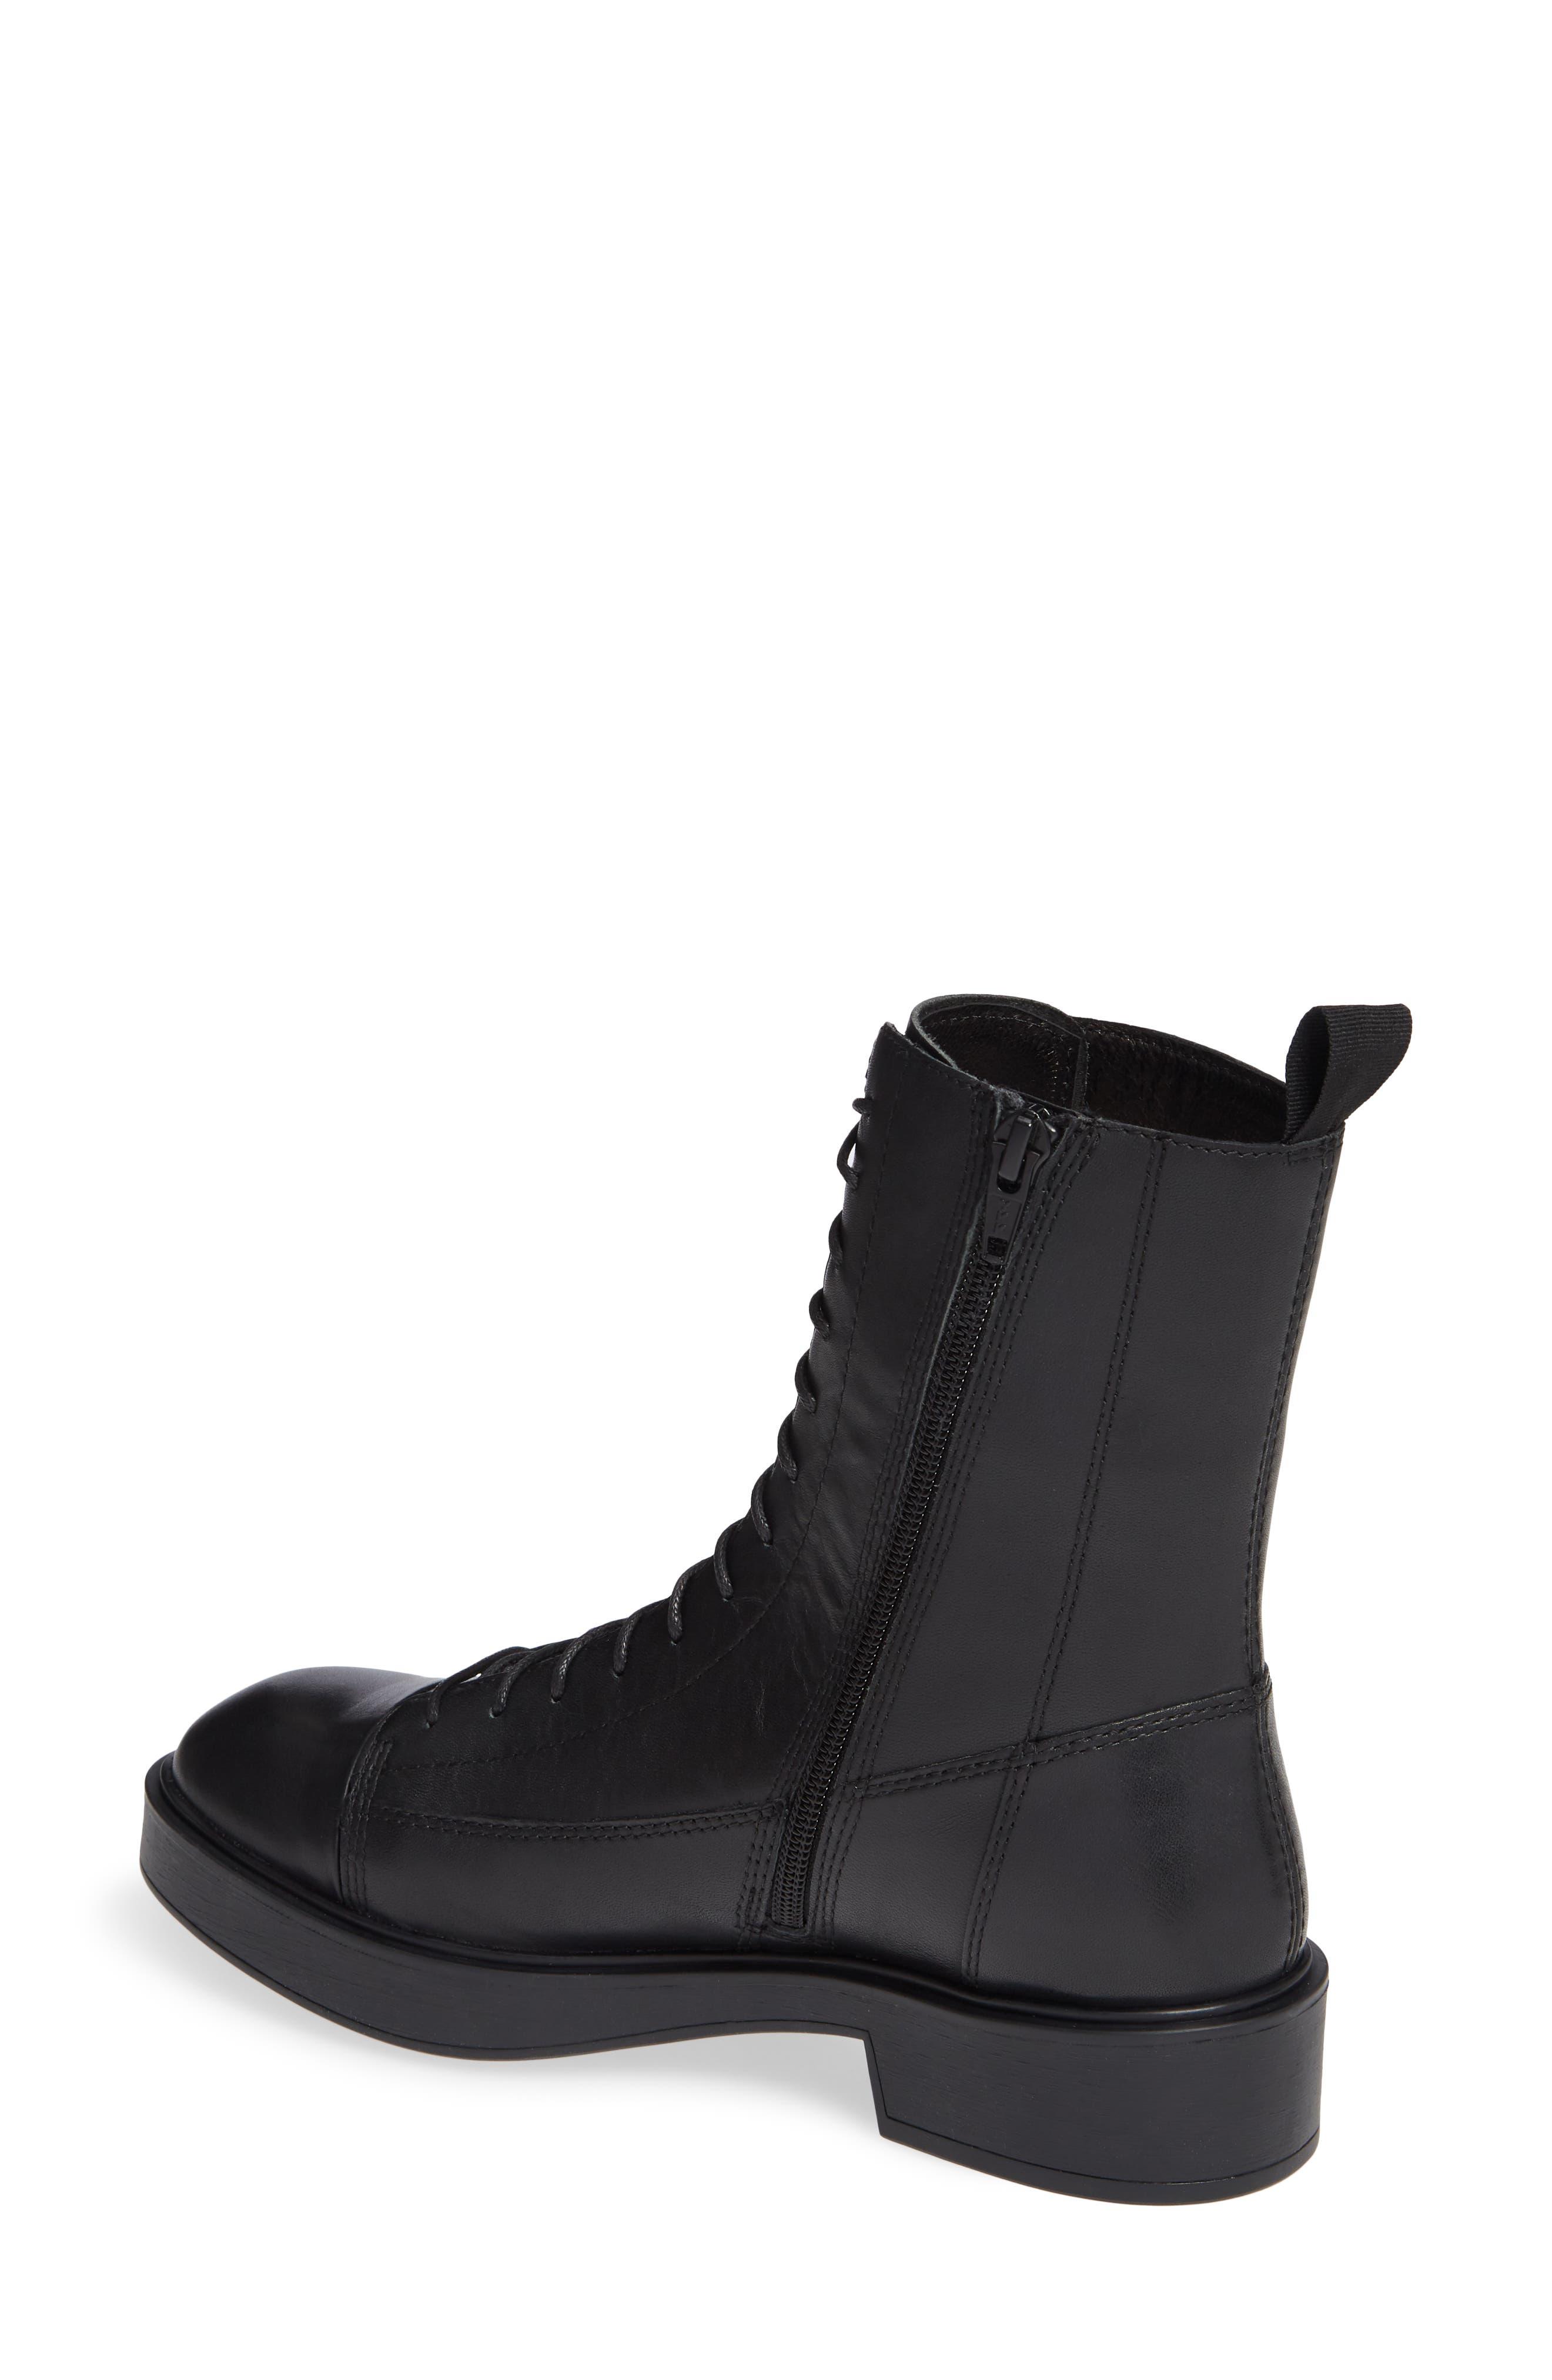 Shoemakers Diane Lace-Up Bootie,                             Alternate thumbnail 2, color,                             BLACK LEATHER